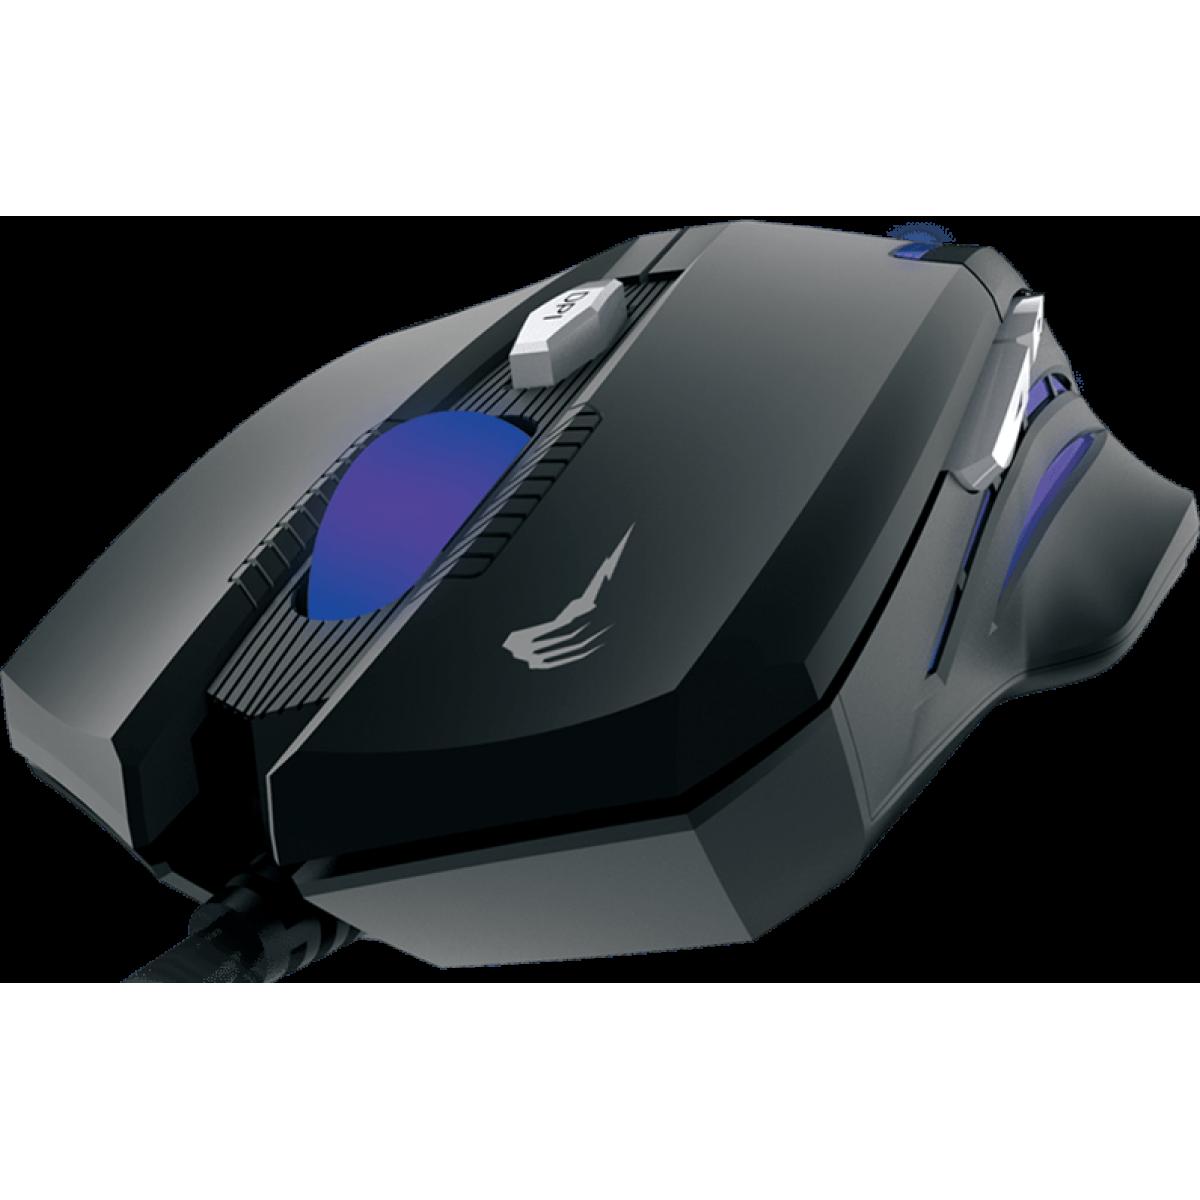 Combo Gamdias Teclado Mecânico Hermes E1 MX Blue + Mouse Demeter E2 3200 DPI + Mouse Pad NYX E1